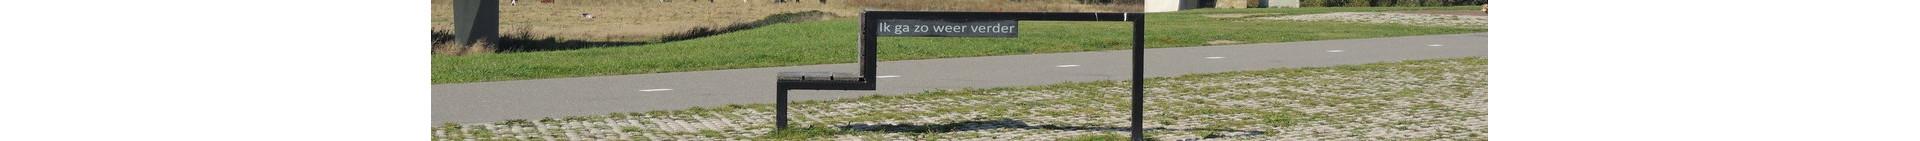 praktijkverdiept.nl